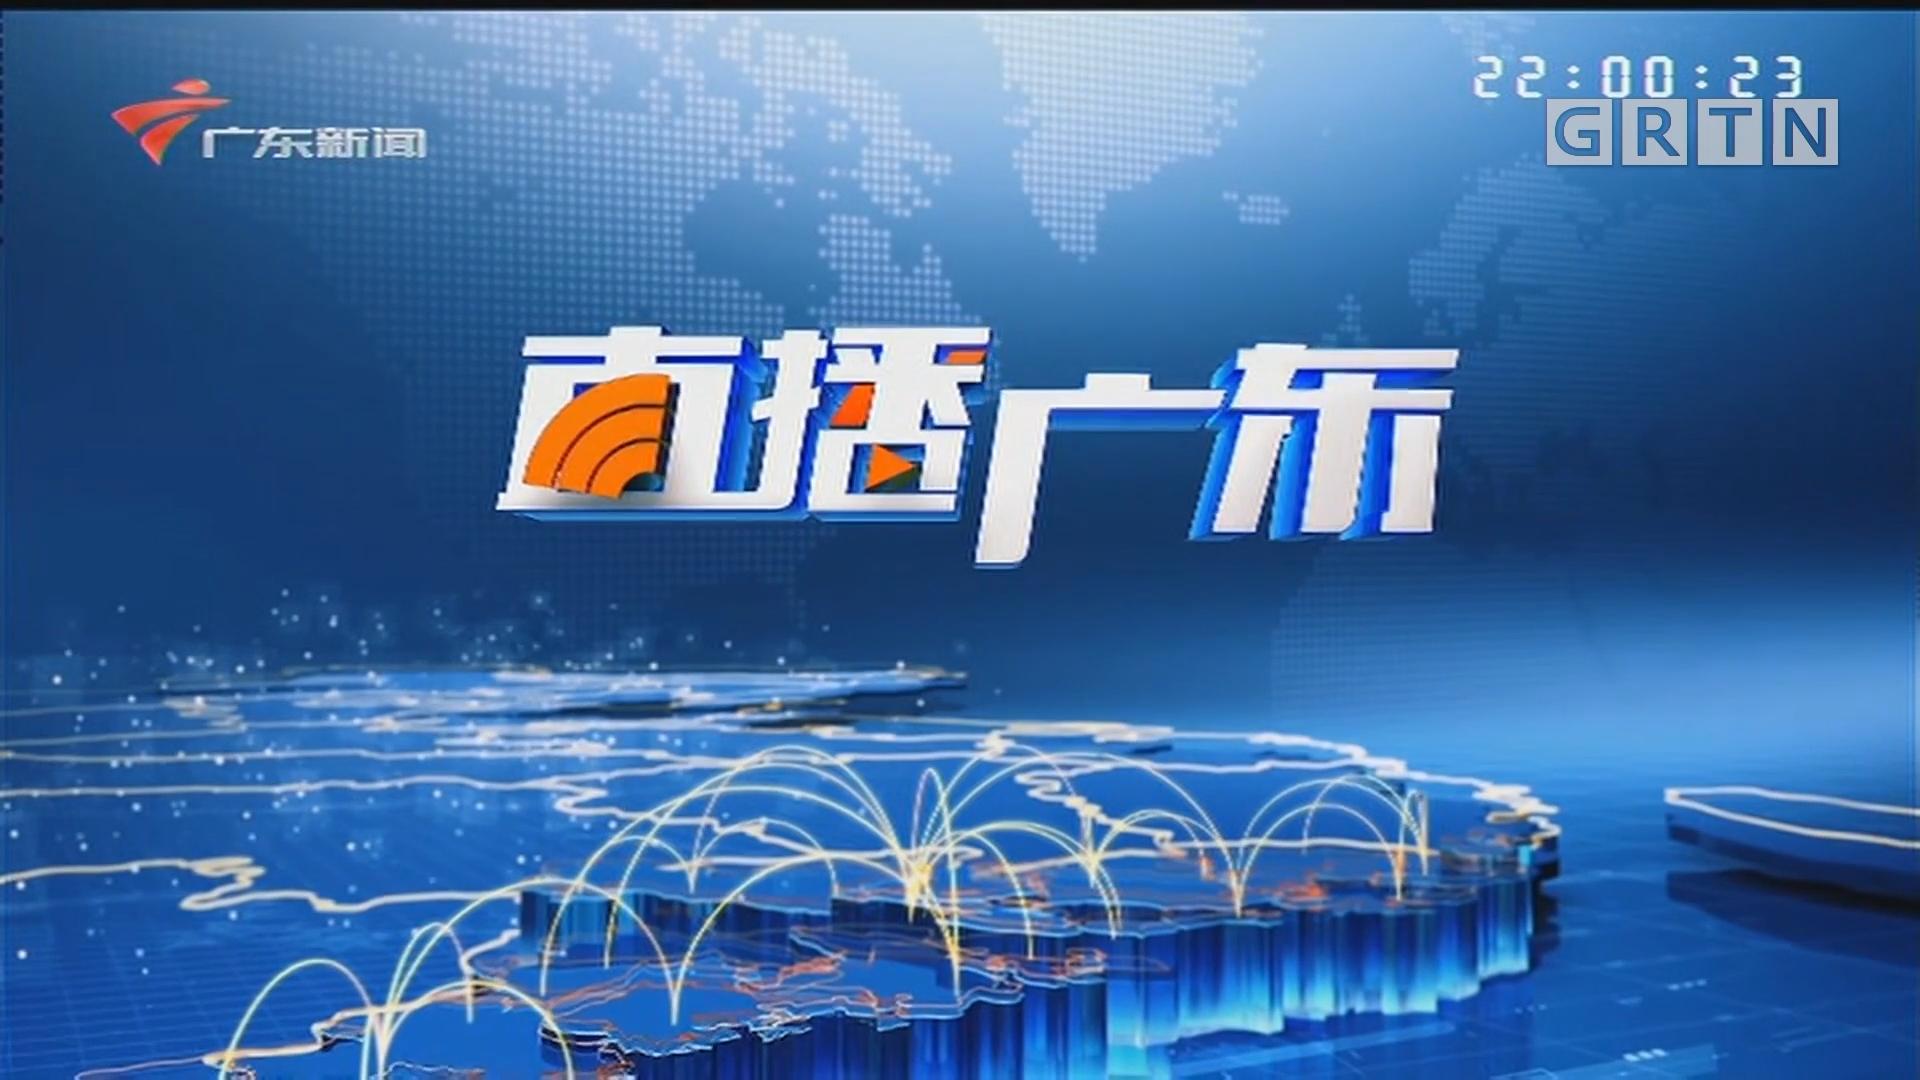 [HD][2020-04-01]直播广东:3月31日当天广州新增境外输入确诊病例有关情况